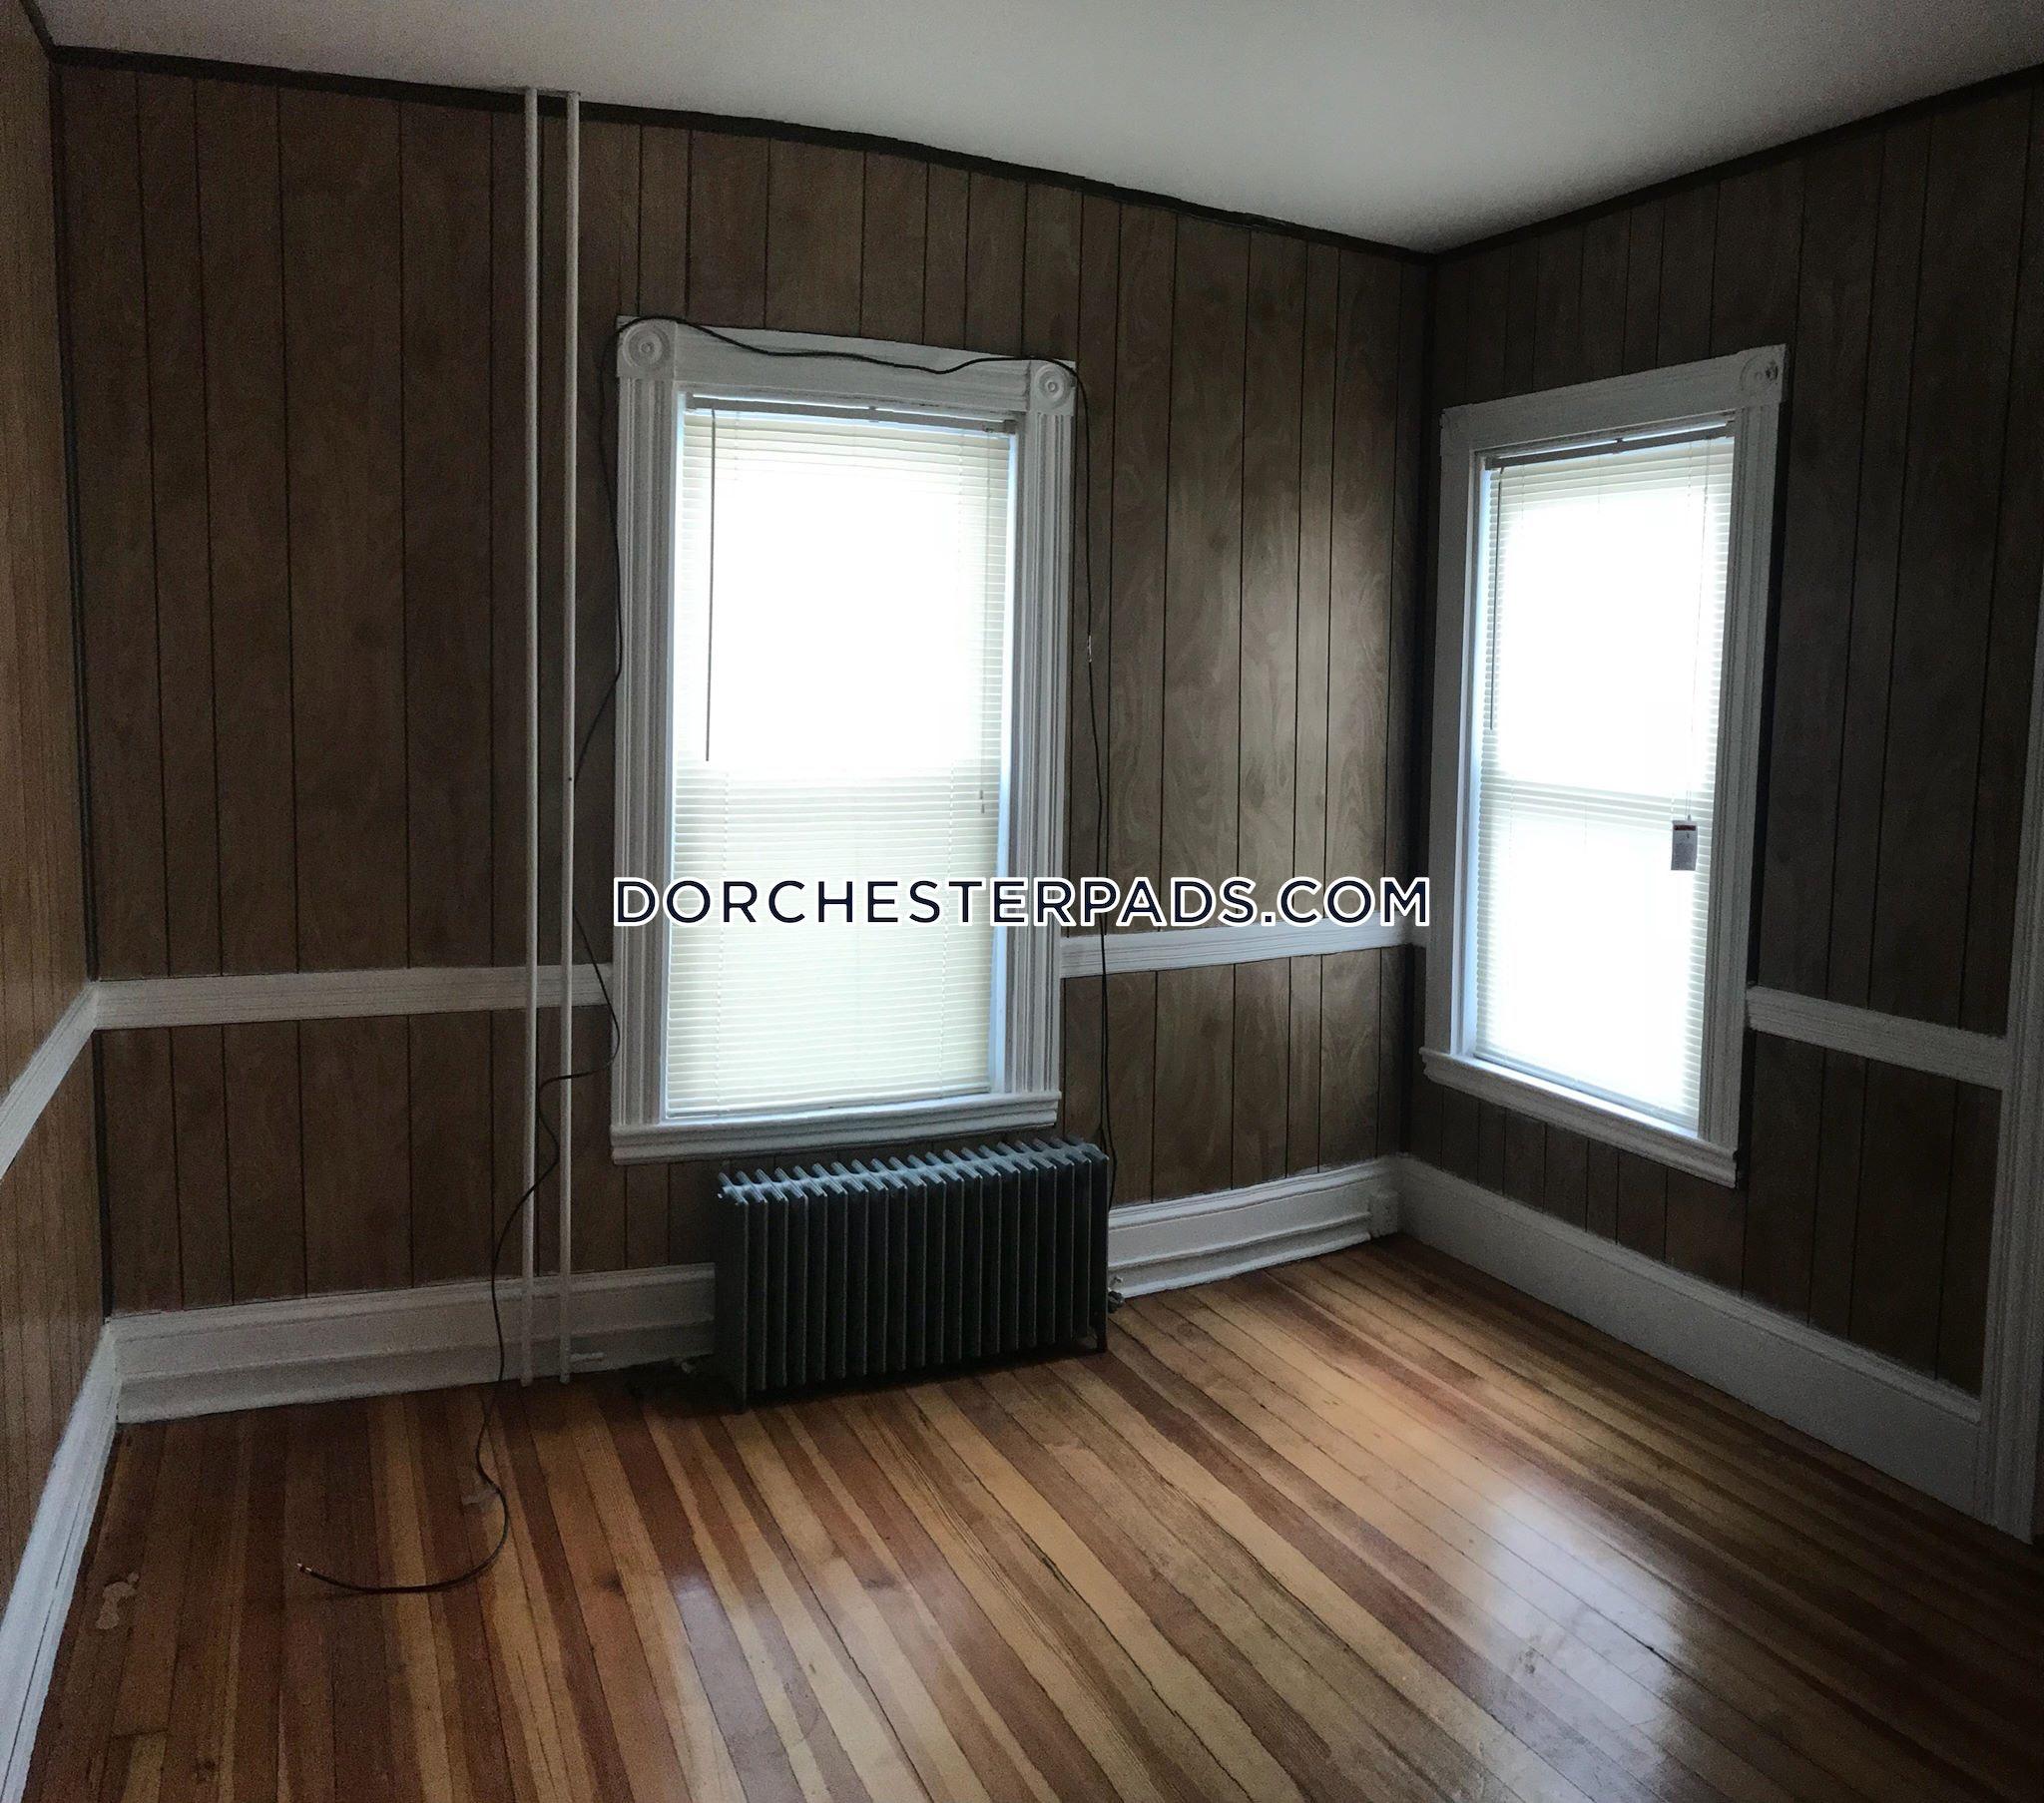 Dorchester Apartment For Rent 2 Bedrooms 1 Bath Boston